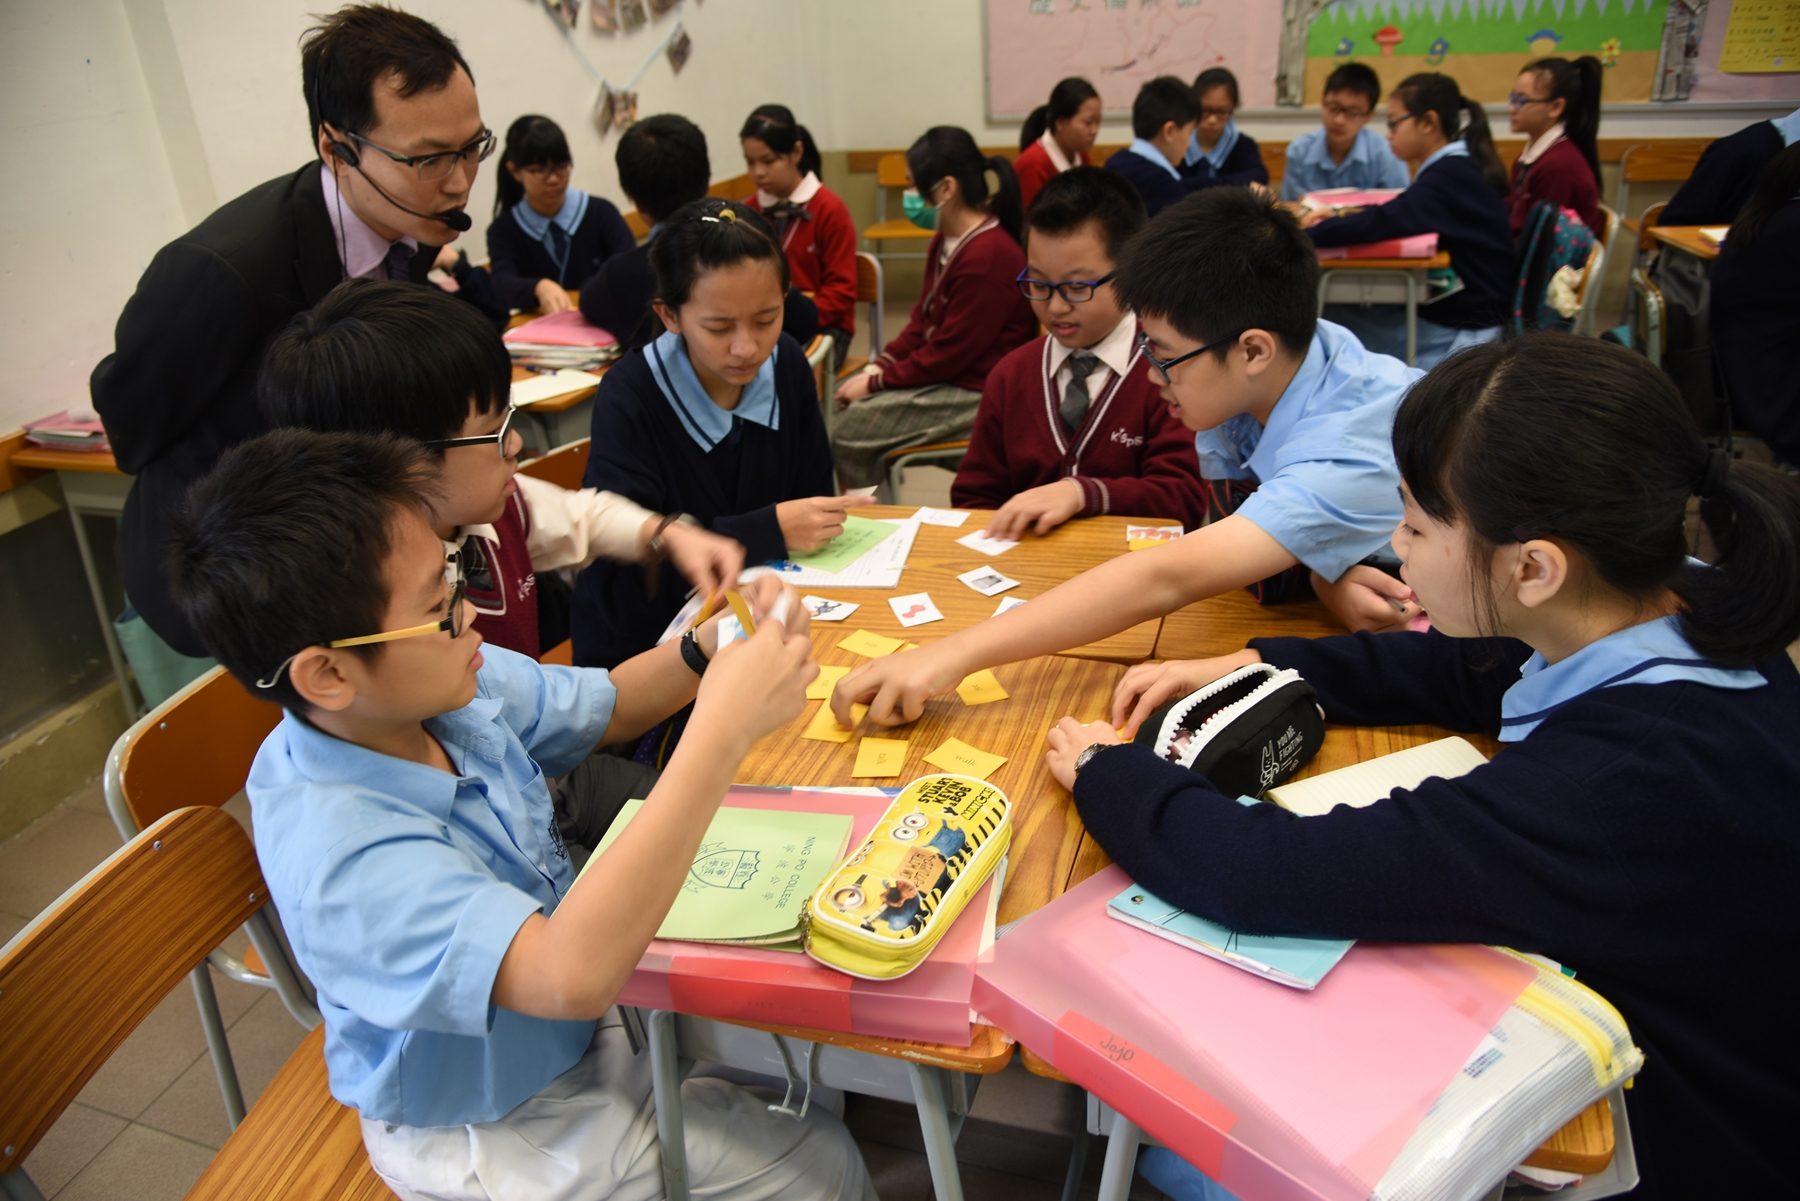 http://npc.edu.hk/sites/default/files/dsc_4993.jpg